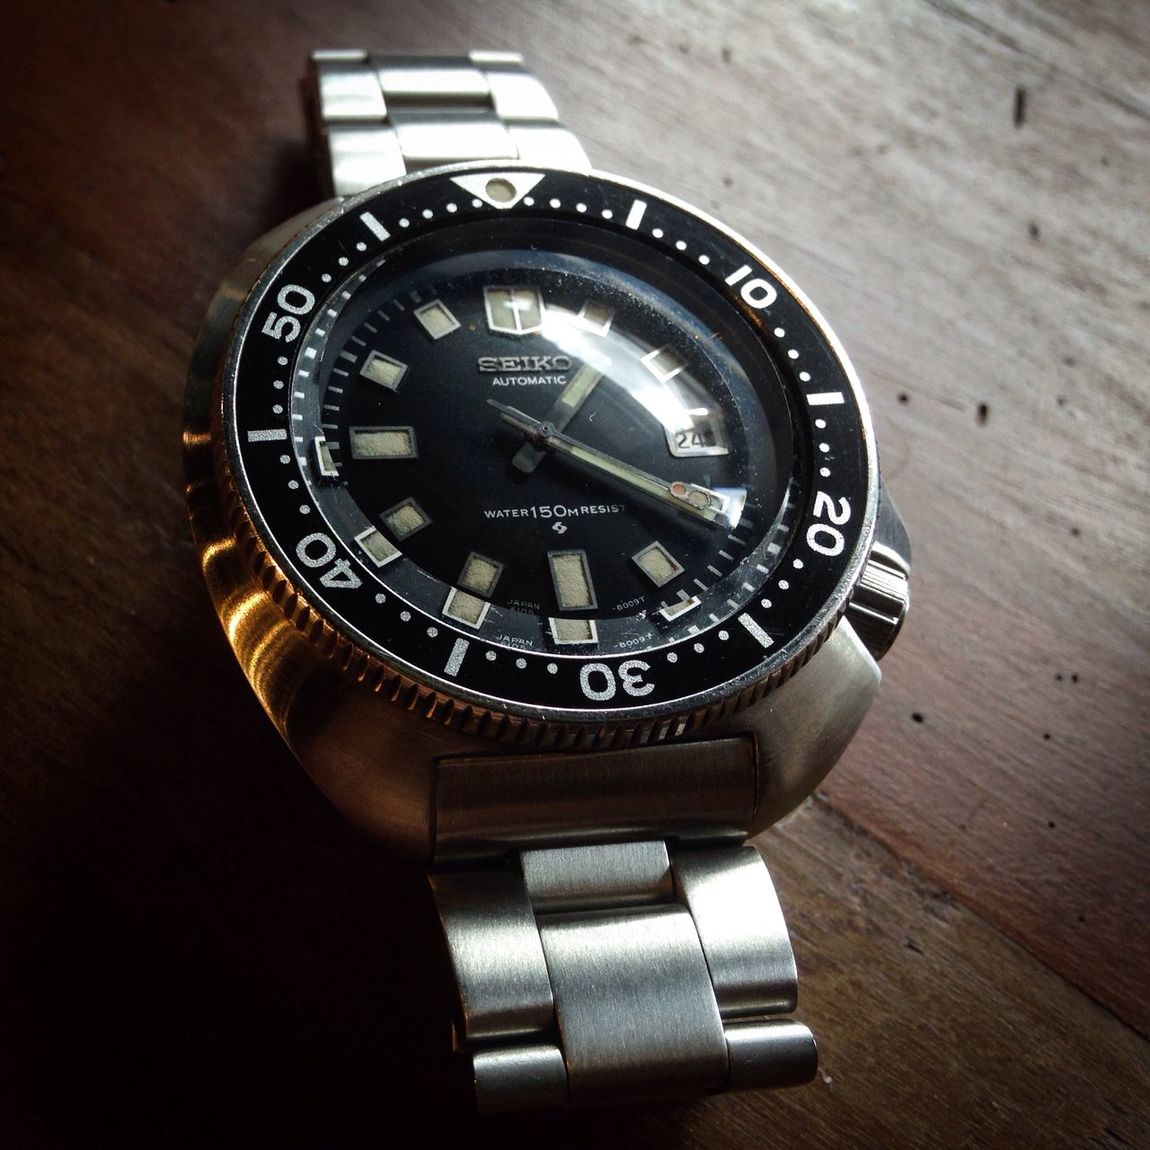 Seiko Watch Time Wristwatch Metal seike6105